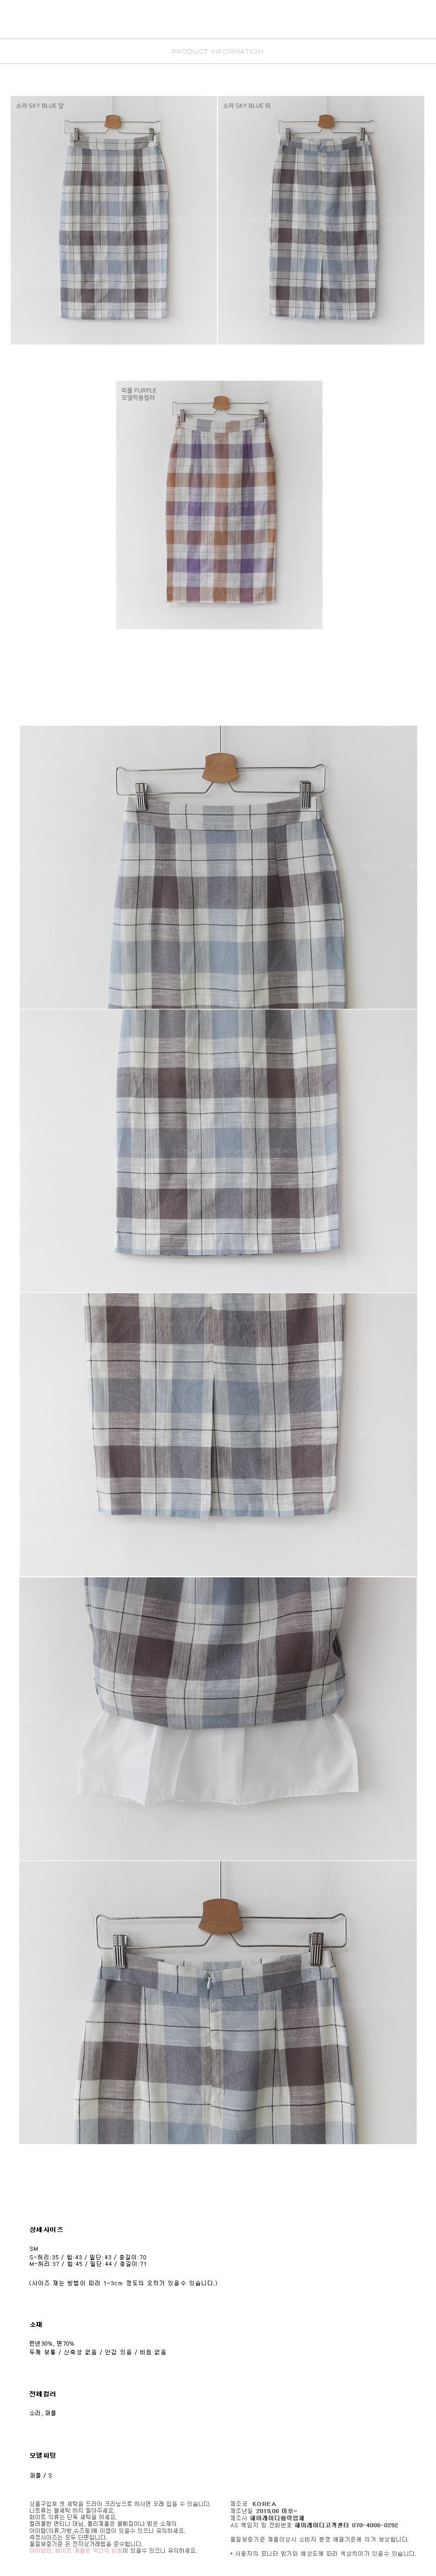 Maron linen checked skirt